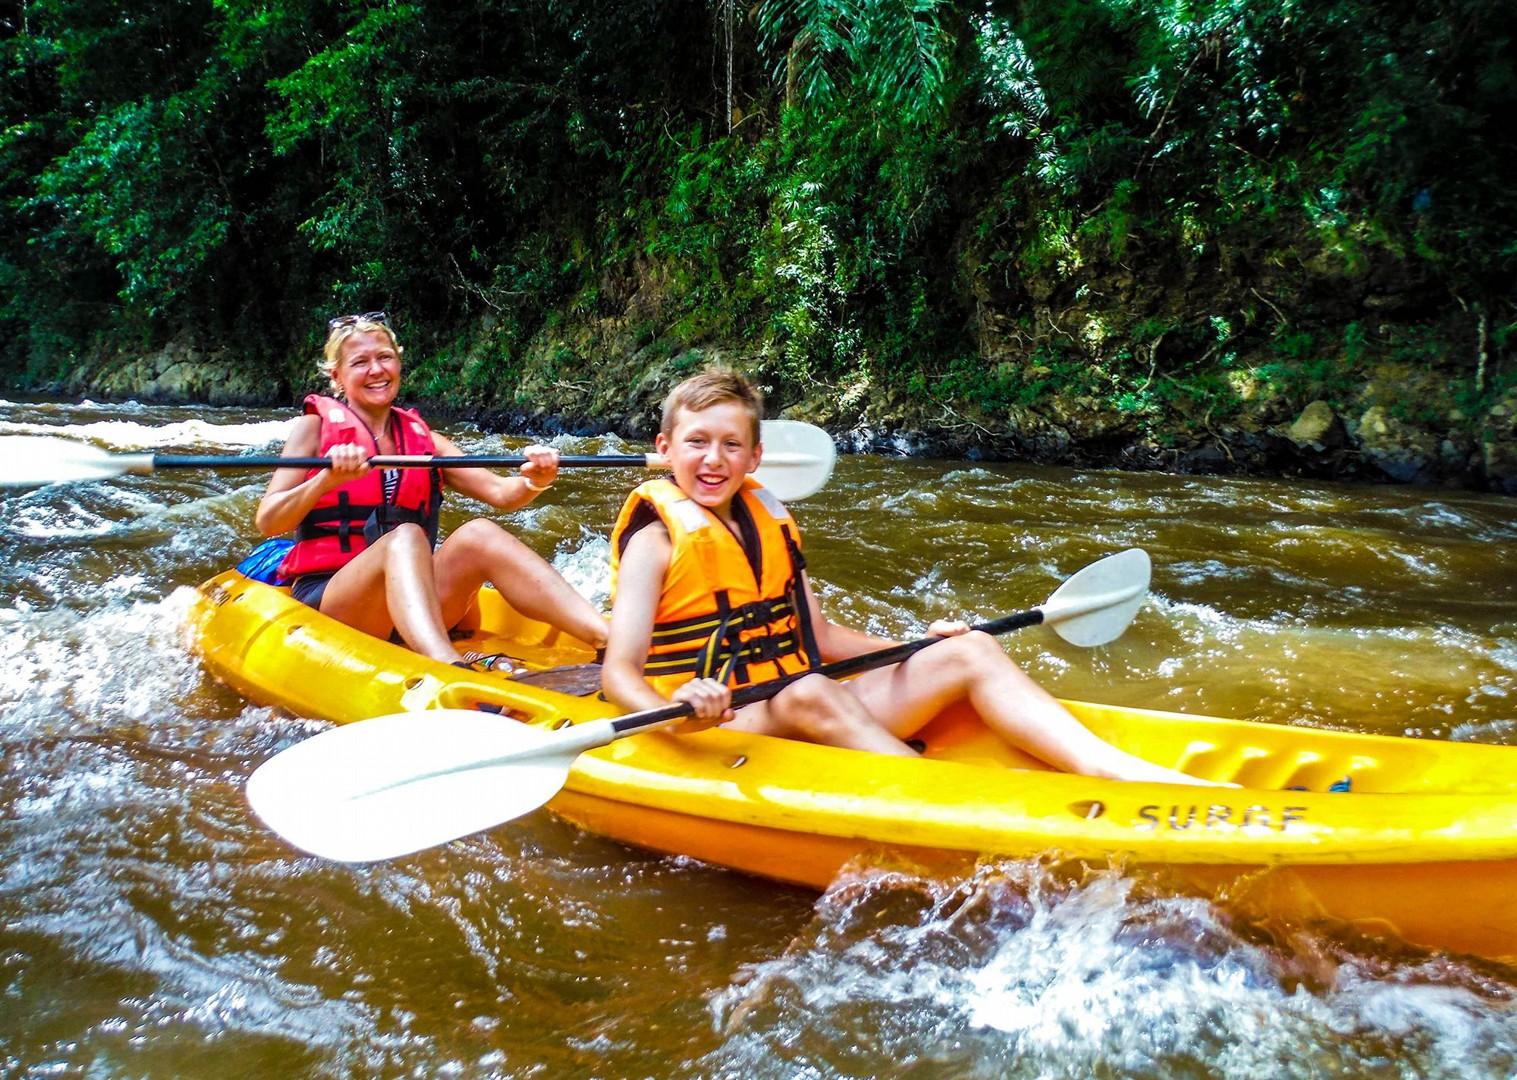 family-borneo-sarawak-holiday-fun-saddle-skeaddle-long-haul.jpg - Borneo - Sarawak Jungle Adventures - Family Cycling